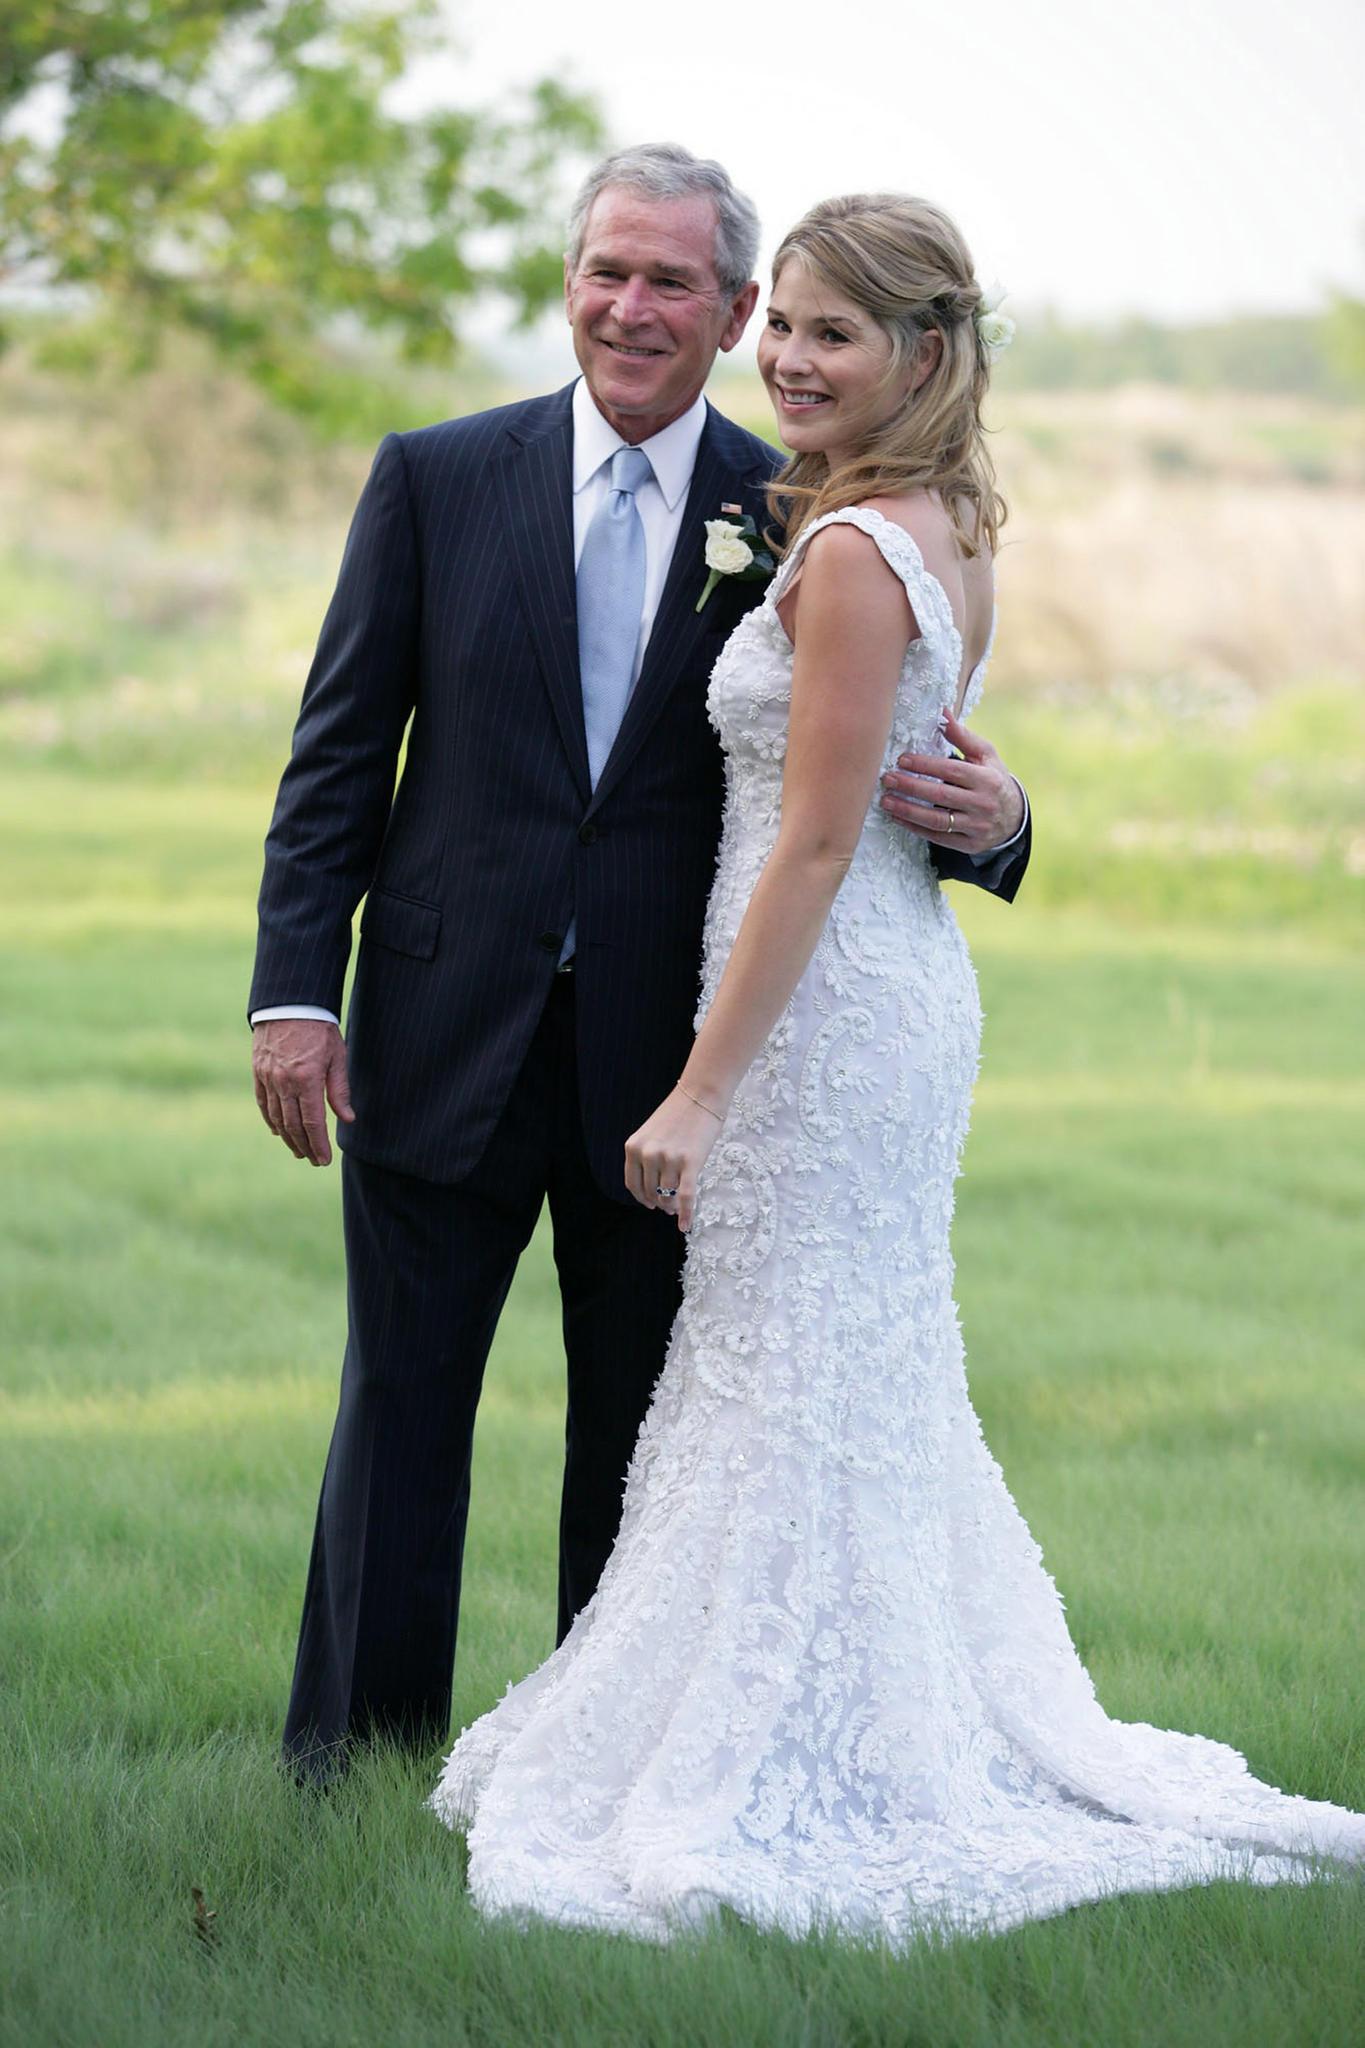 Jenna Bush Hager und George W. Bush